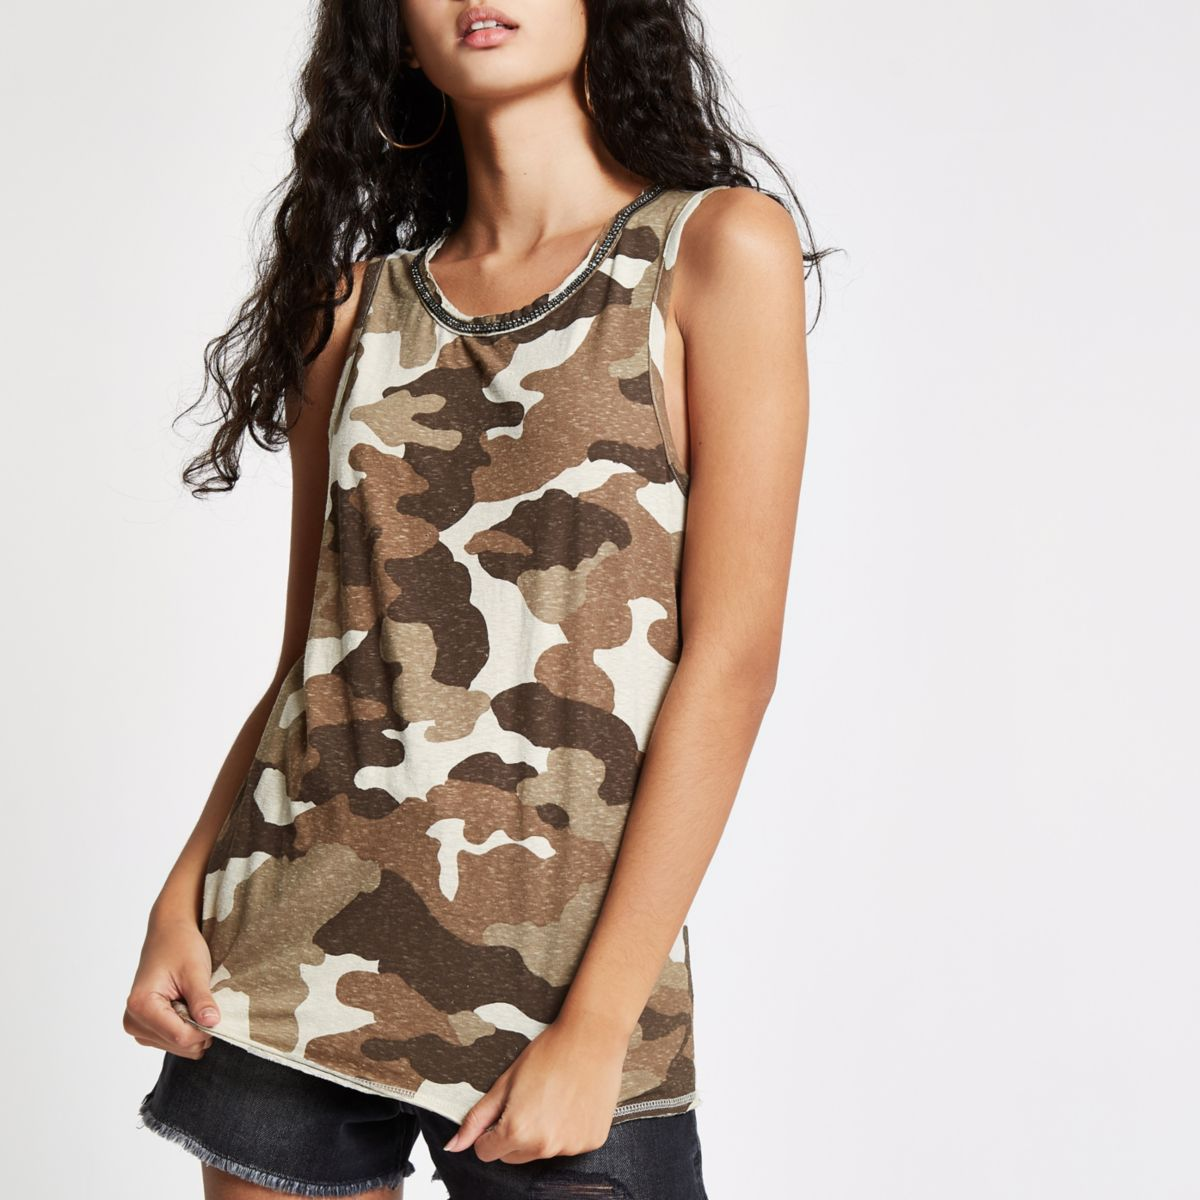 Kaki tanktop met verfraaide hals en camouflageprint